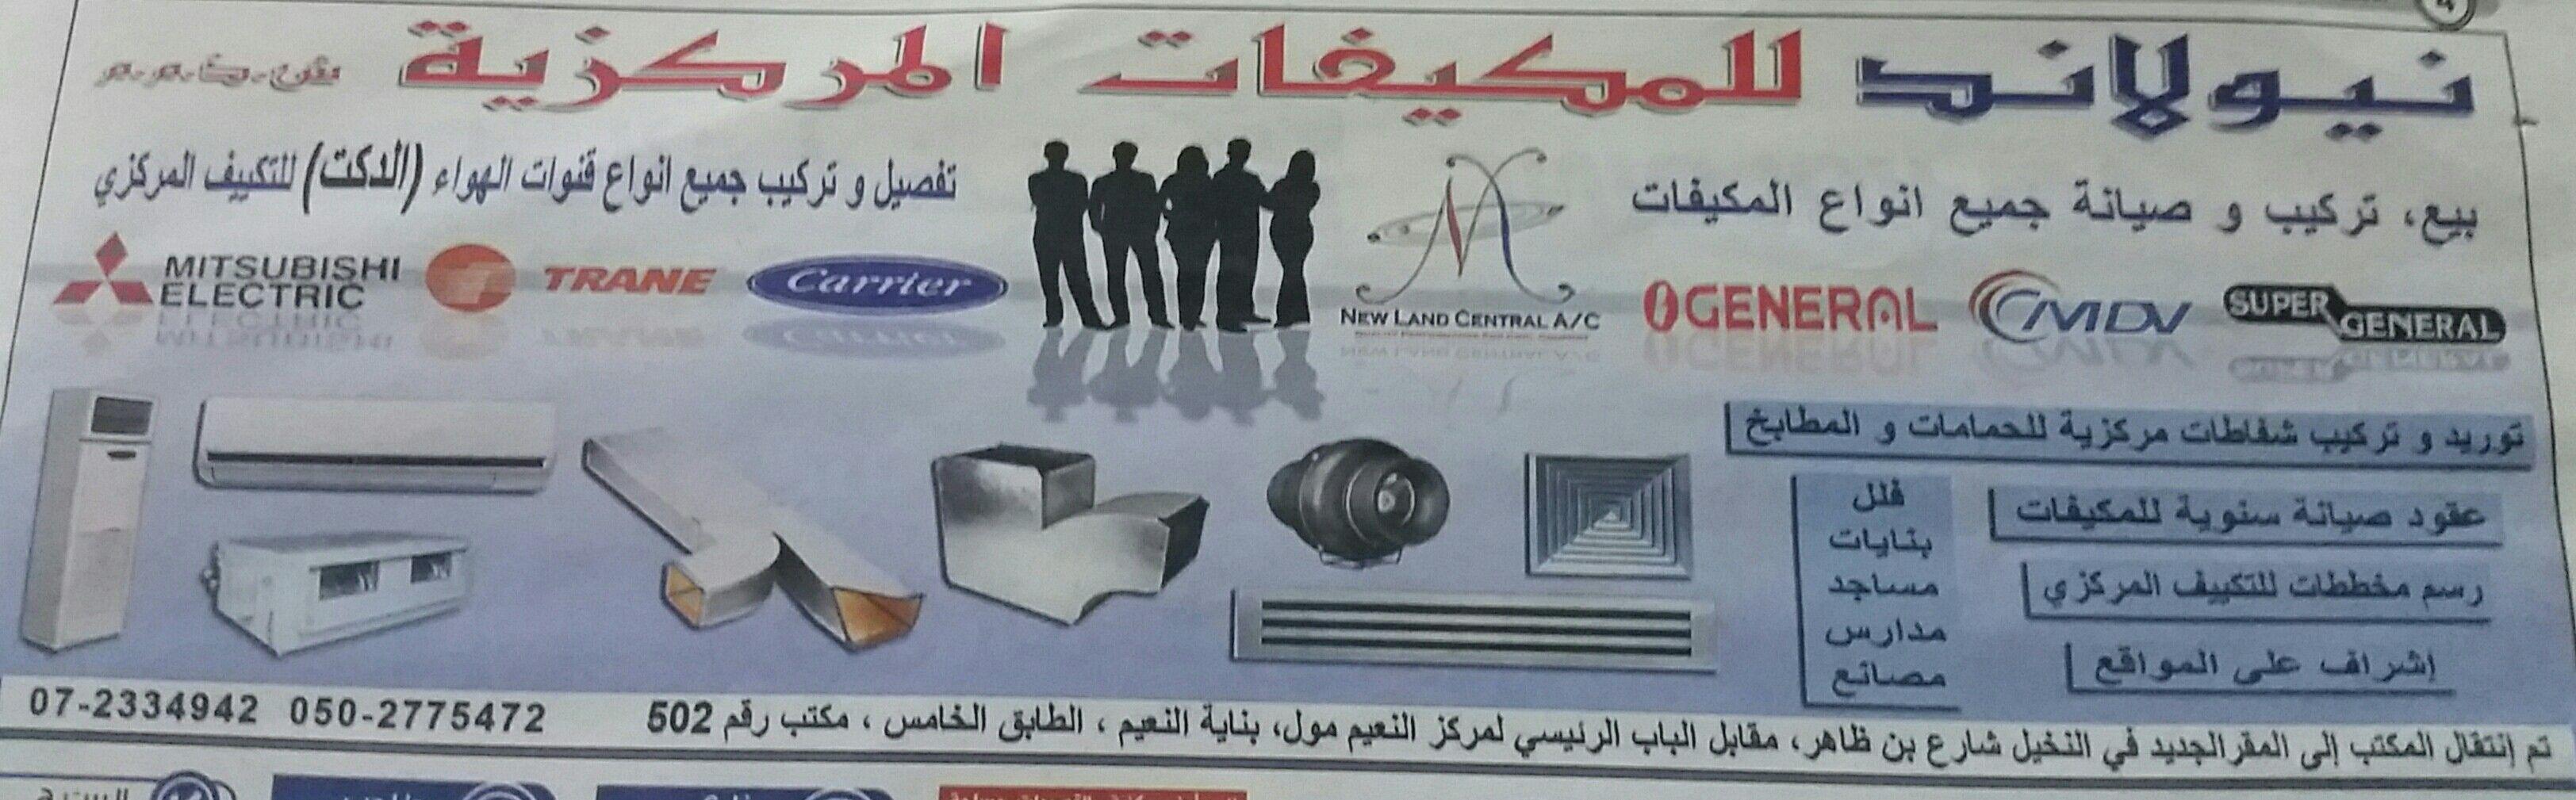 Pin By شما المرزوقي On إعلانات Lano Trane Tableware